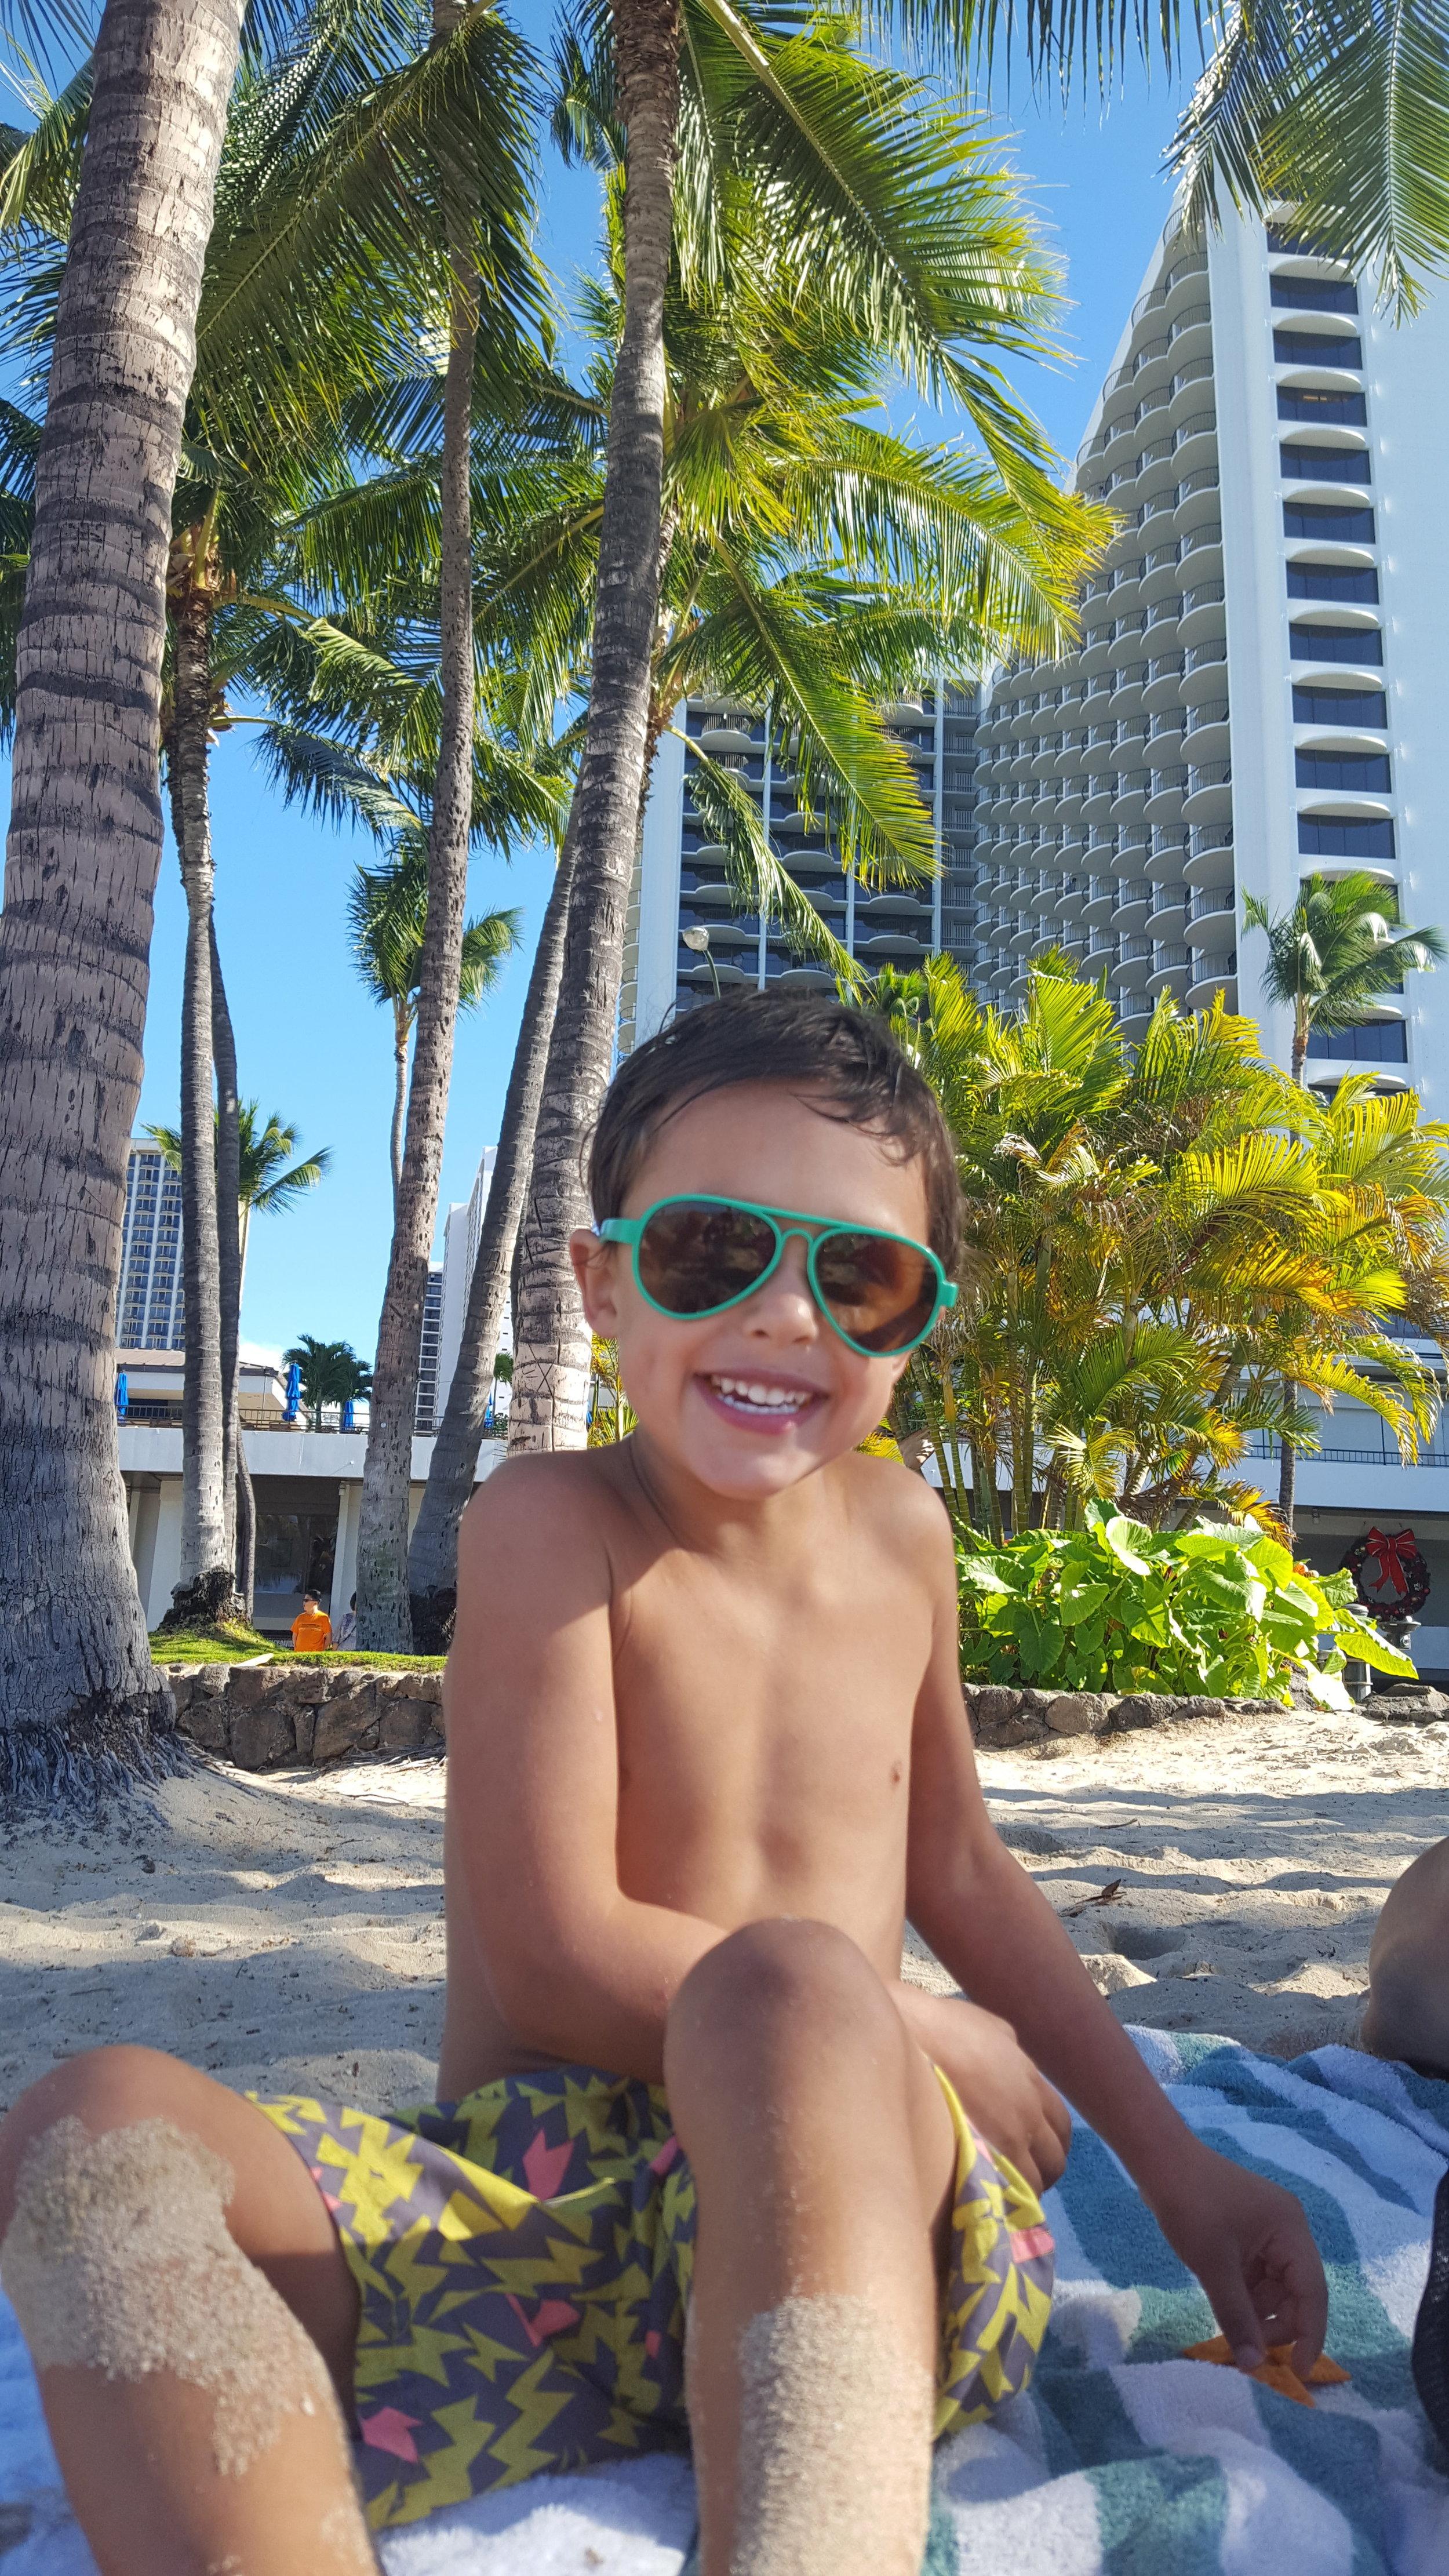 Bennett on Waikiki Beach